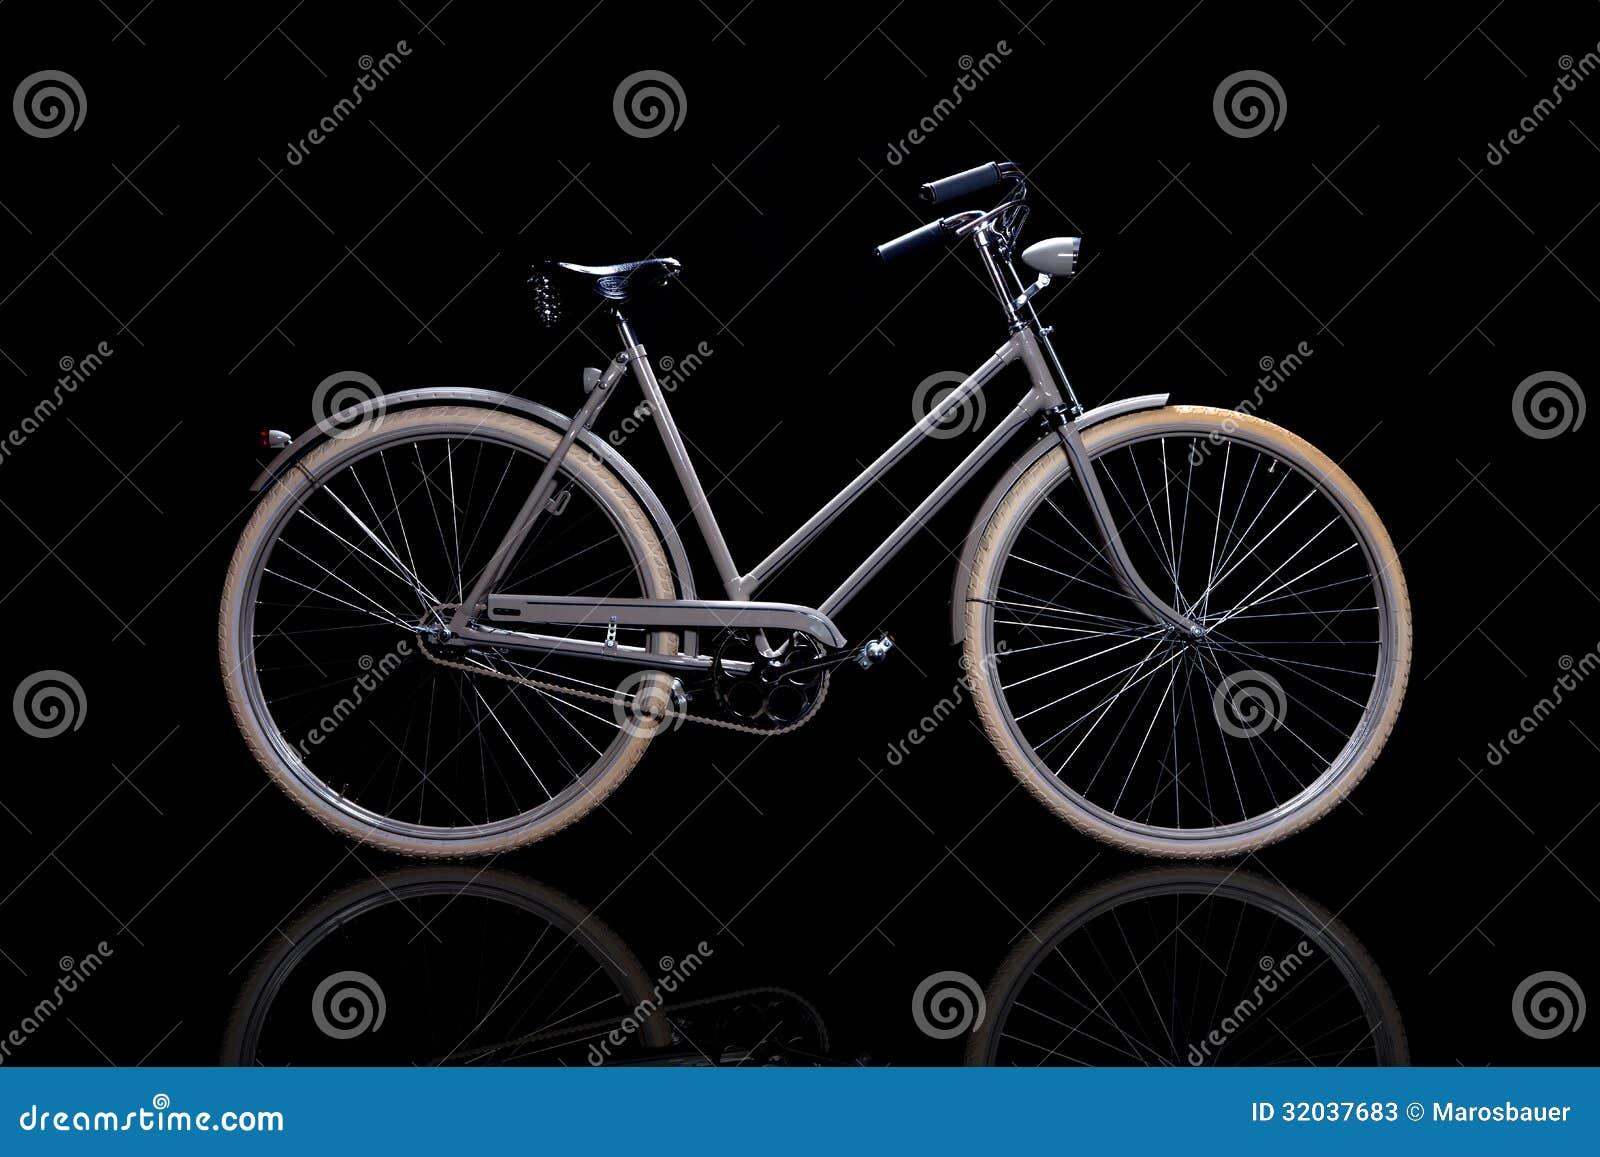 altes ge berholtes retro fahrrad. Black Bedroom Furniture Sets. Home Design Ideas